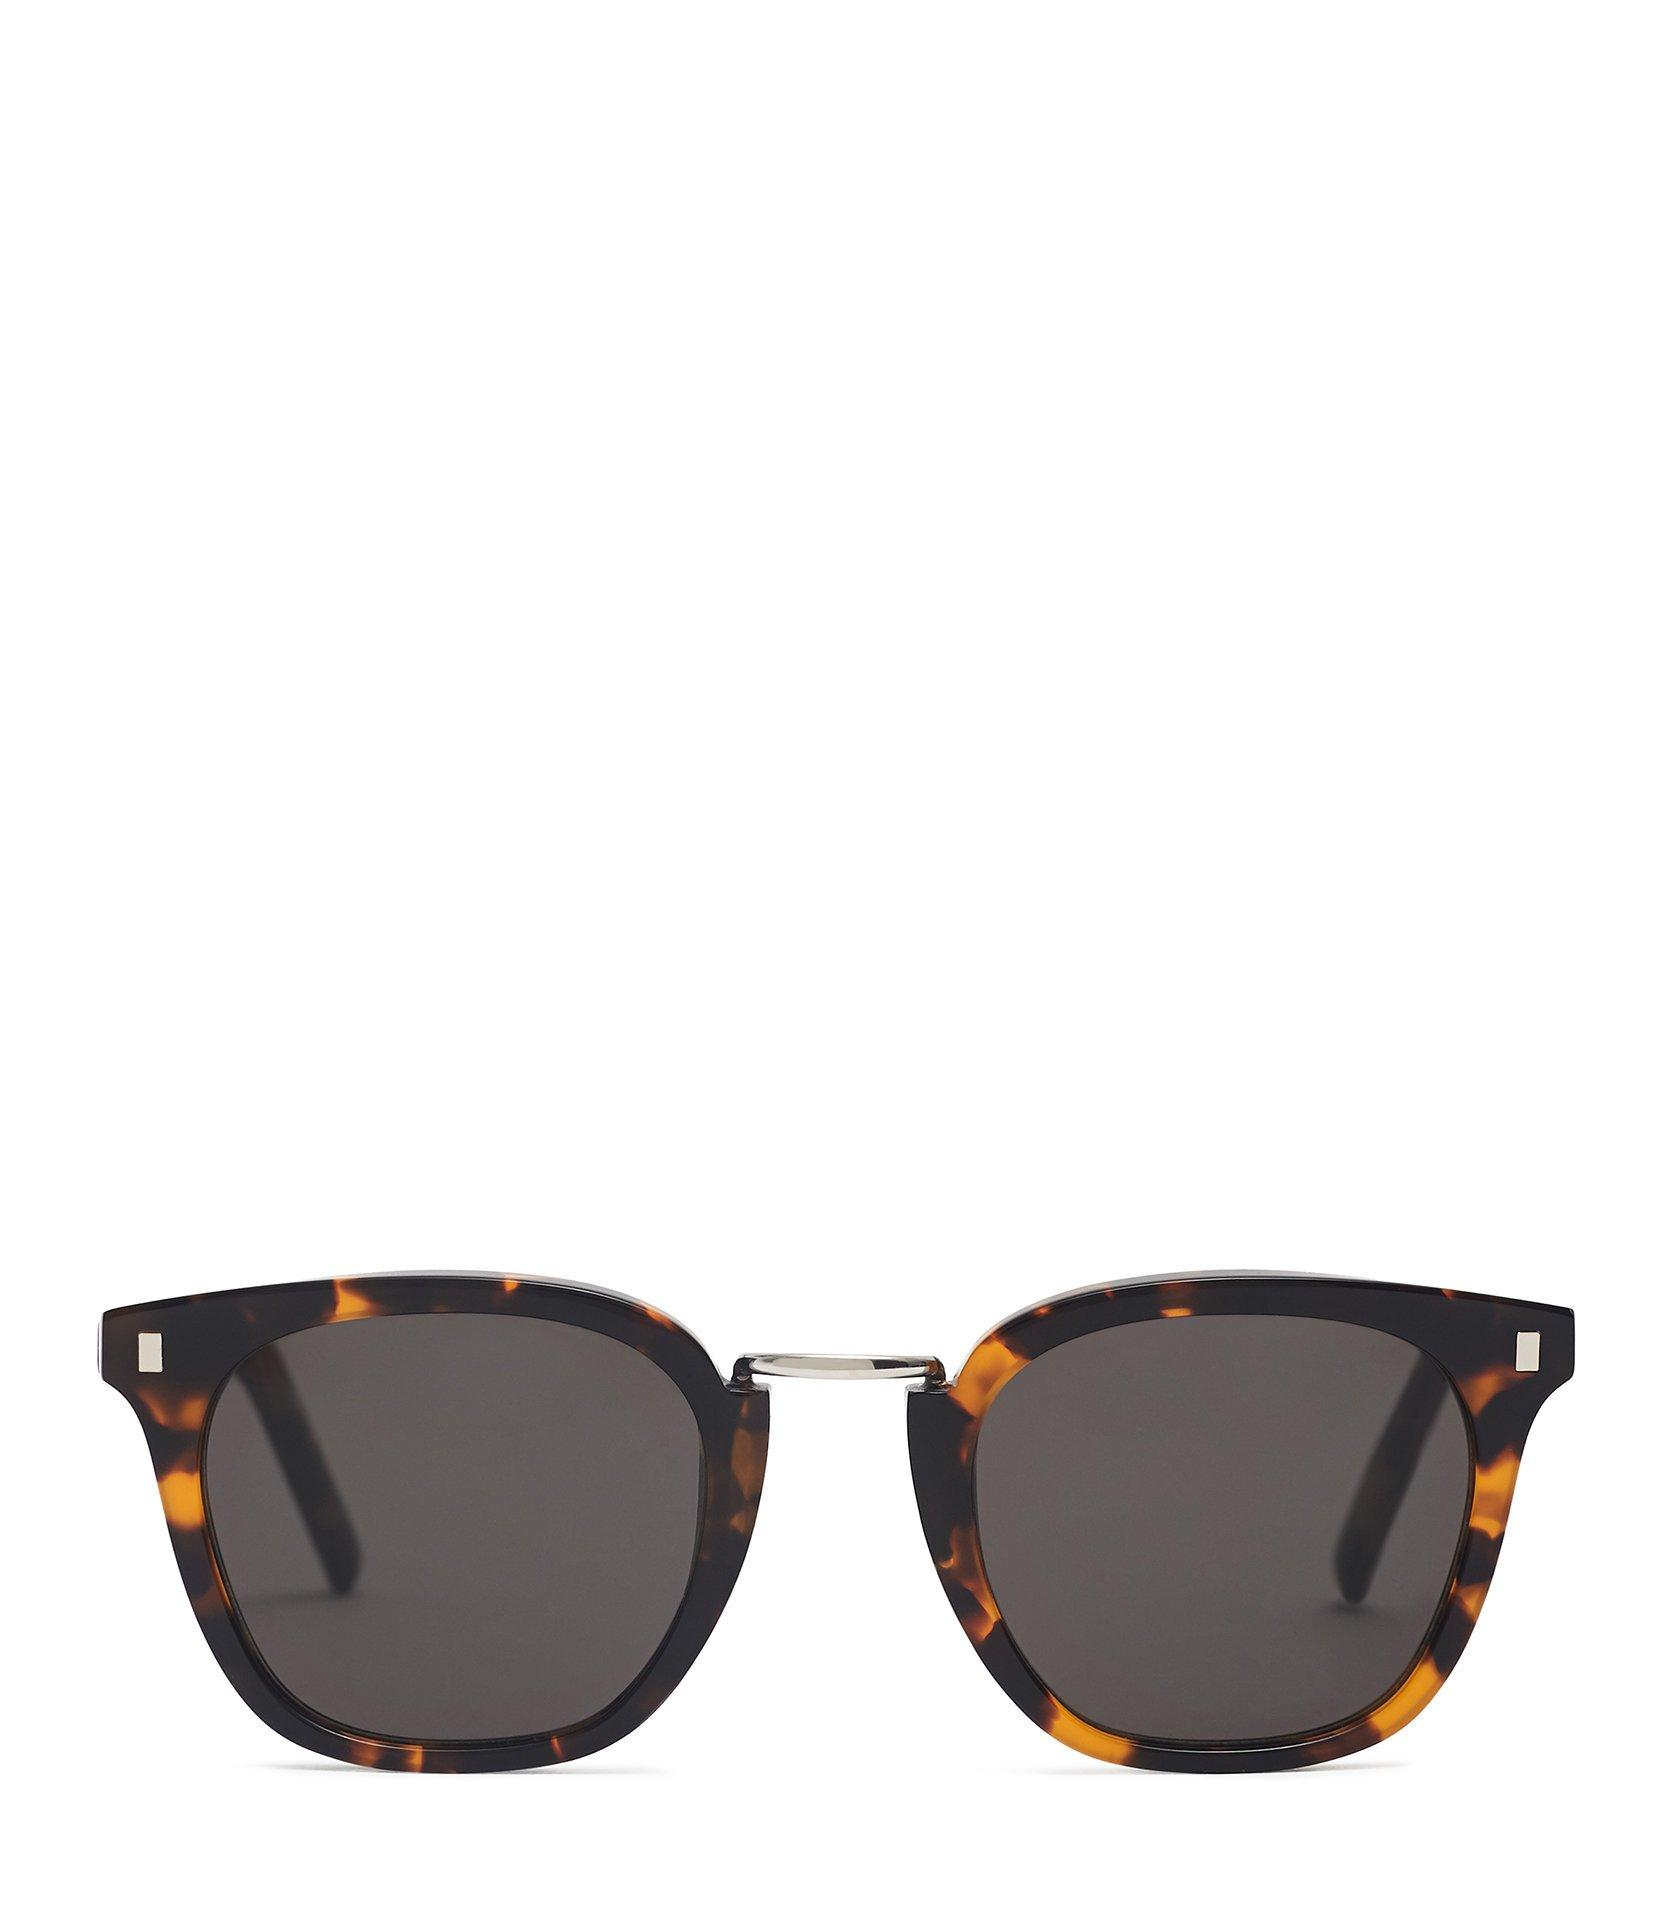 155e73534d Reiss Ando - Monokel Eyewear Bridge Sunglasses for Men - Lyst